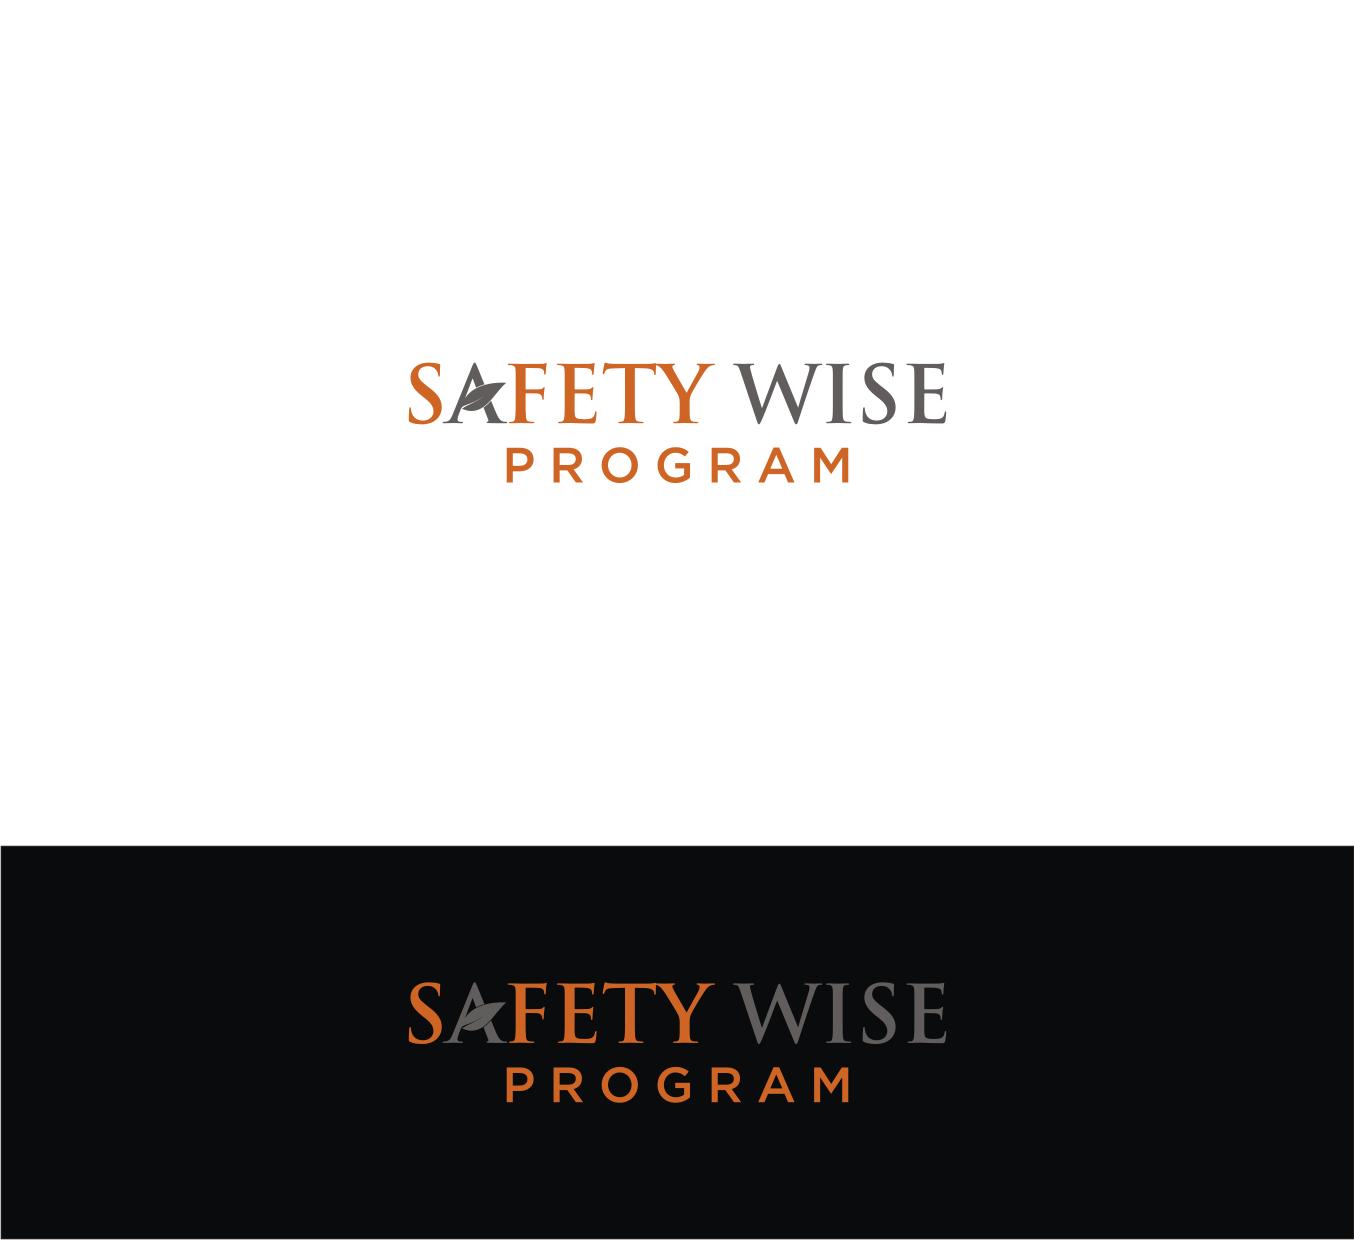 Logo Design by Sigitumarali Sigit - Entry No. 122 in the Logo Design Contest New Logo Design for Safety Wise Program.